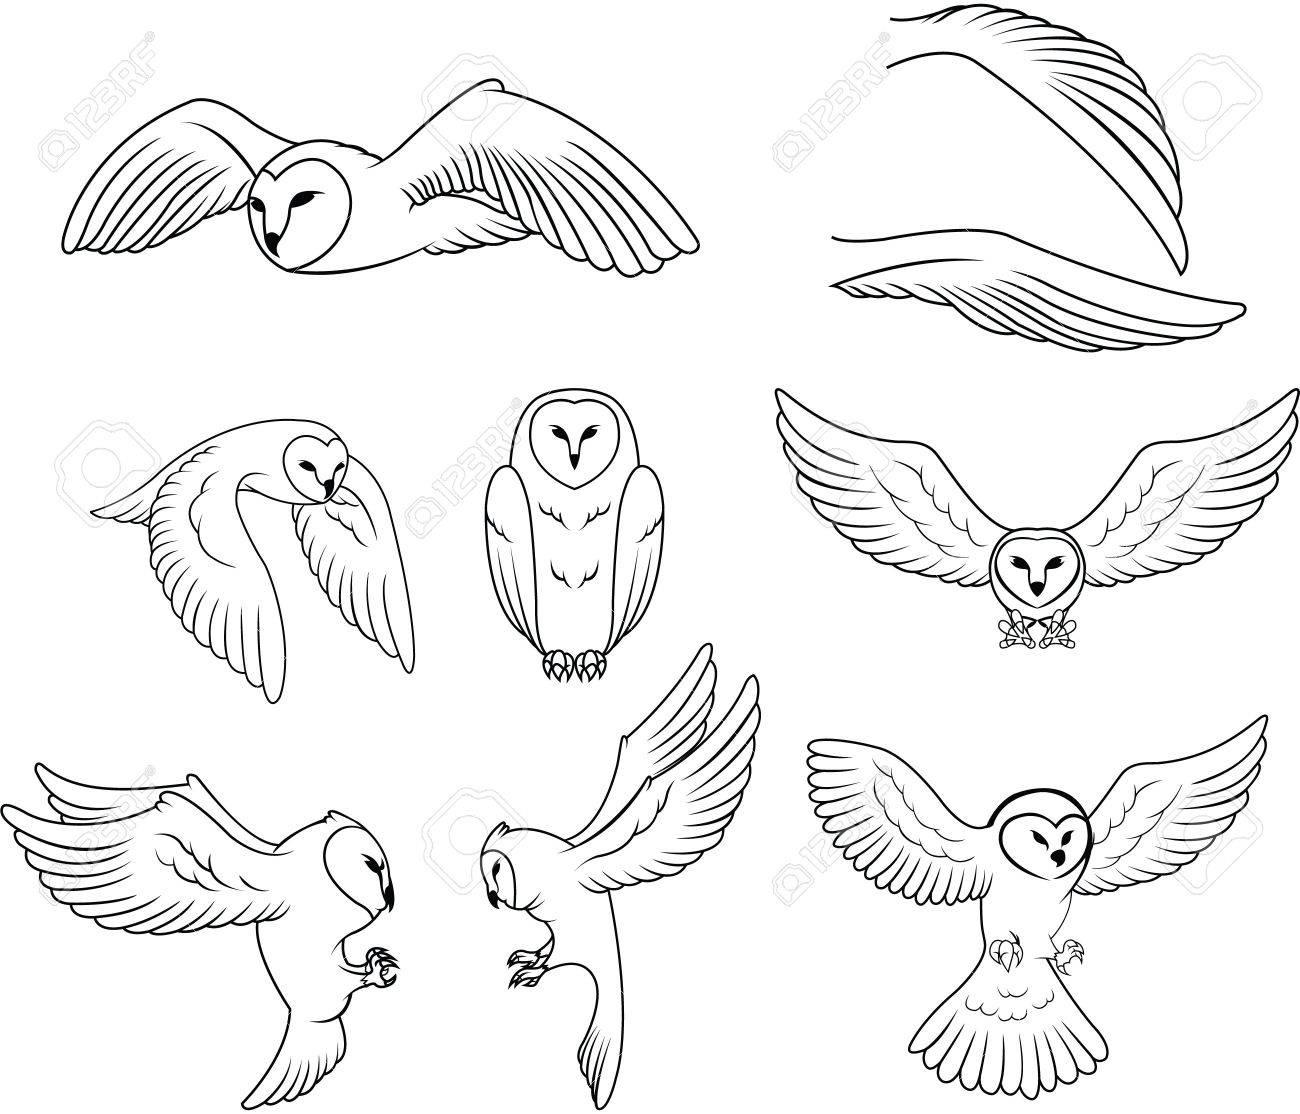 Owl - 46370464